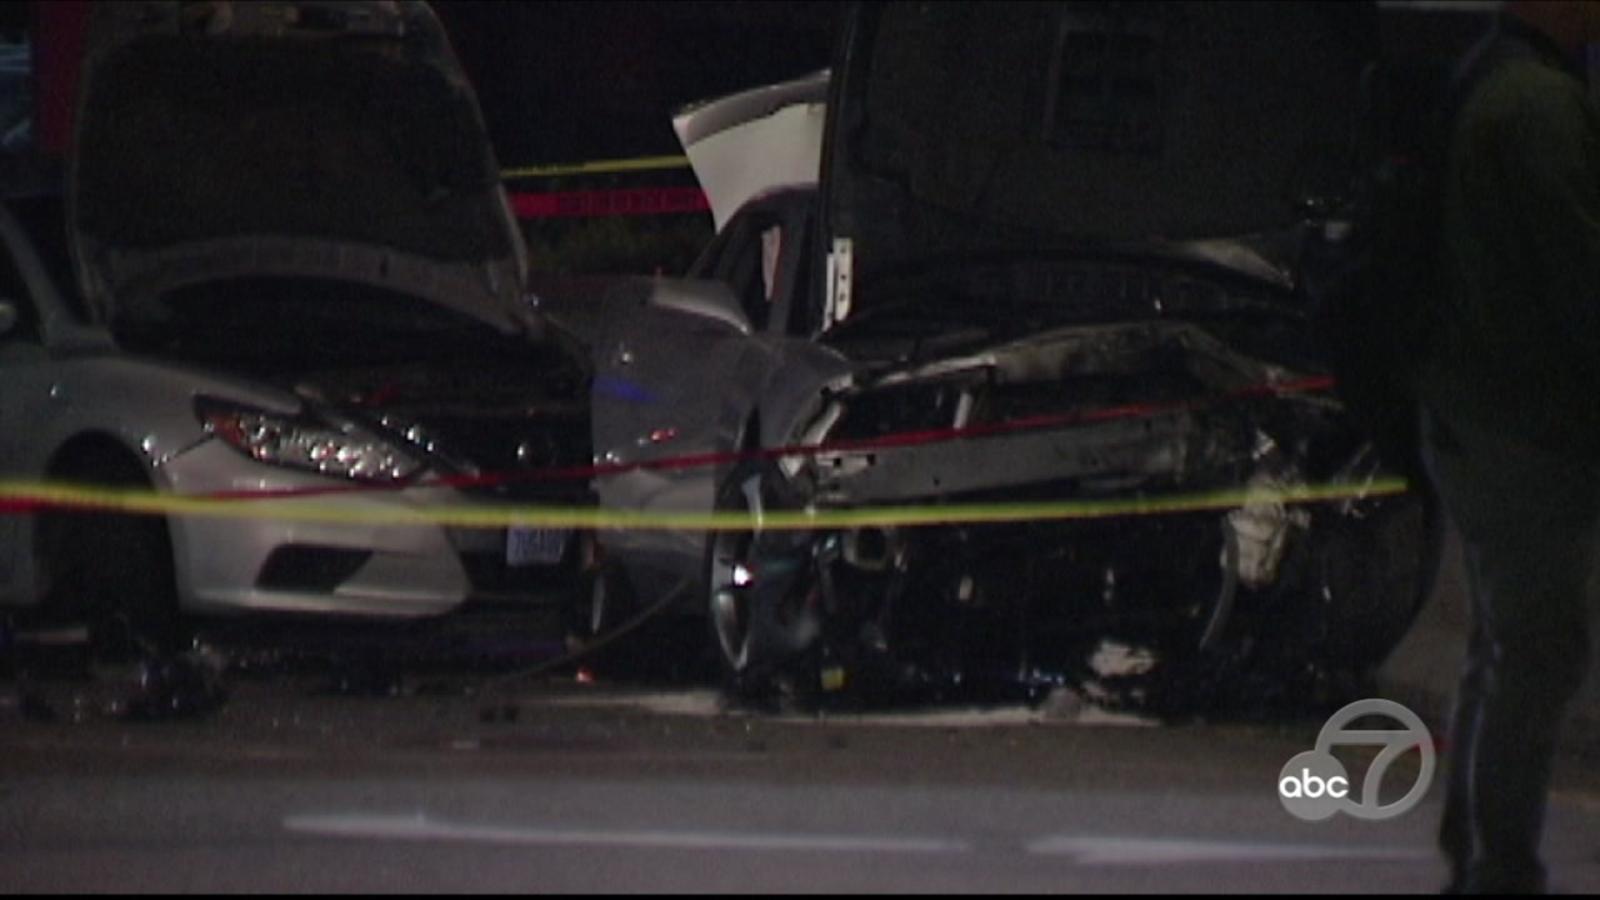 1 dead, 1 injured after car crash in San Francisco's Potrero Hill